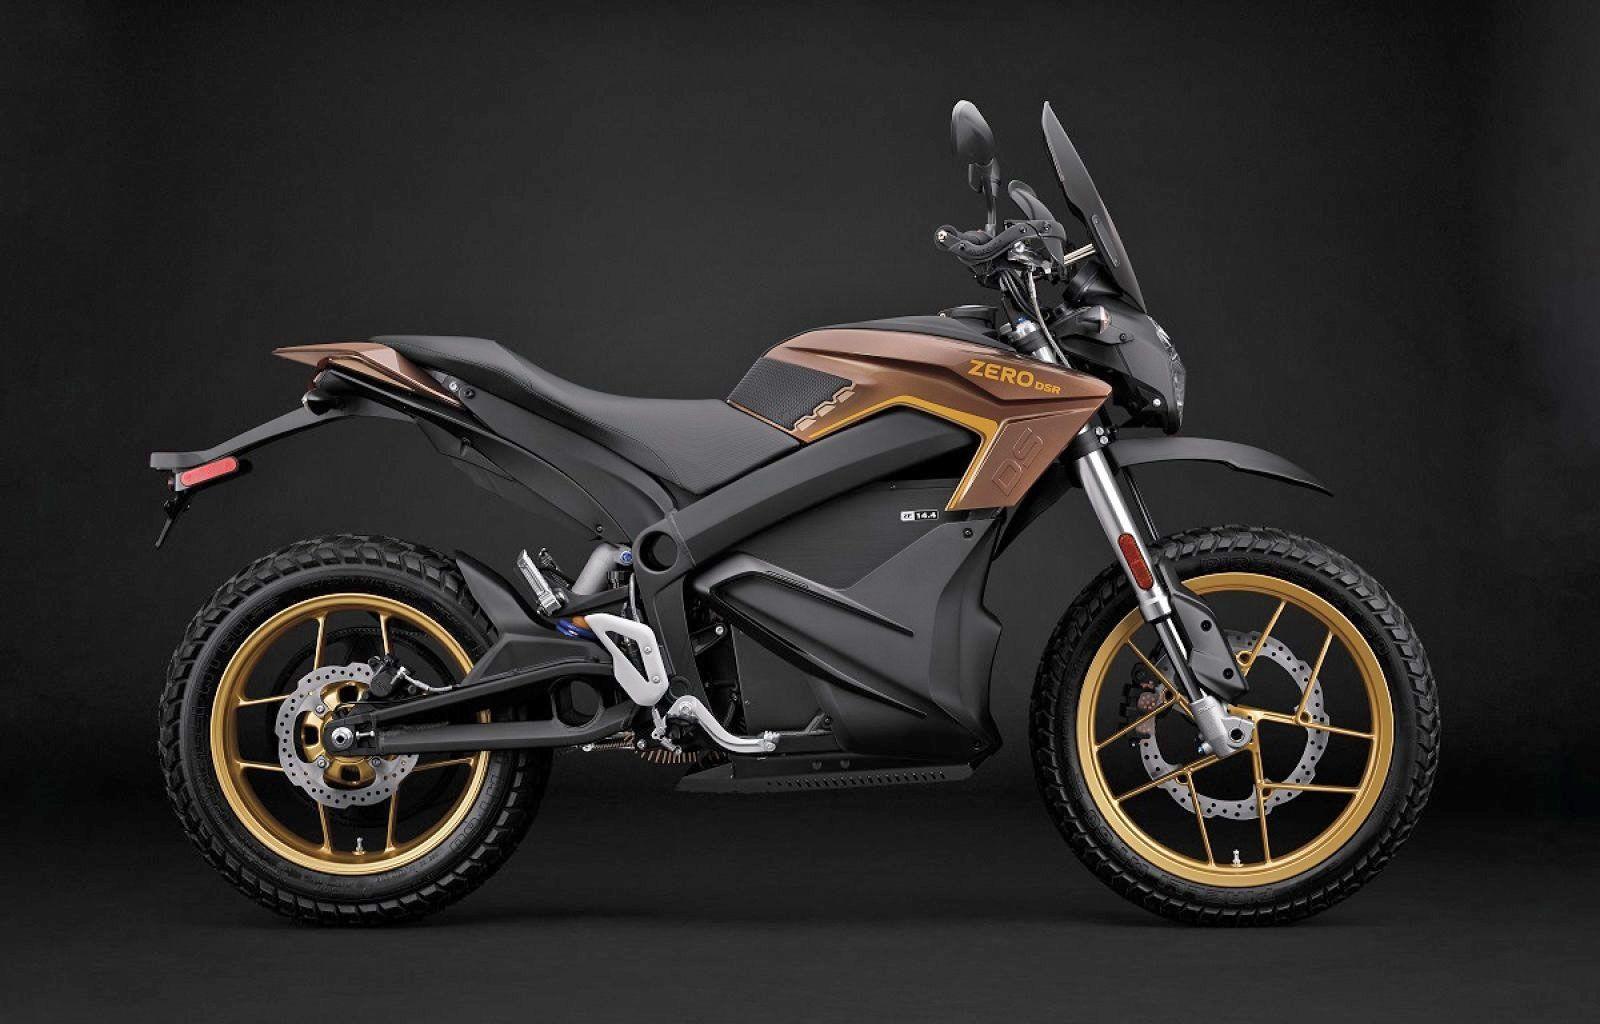 Zero Motorcycles 2019 Line Up Boasts More Power And Longer Range